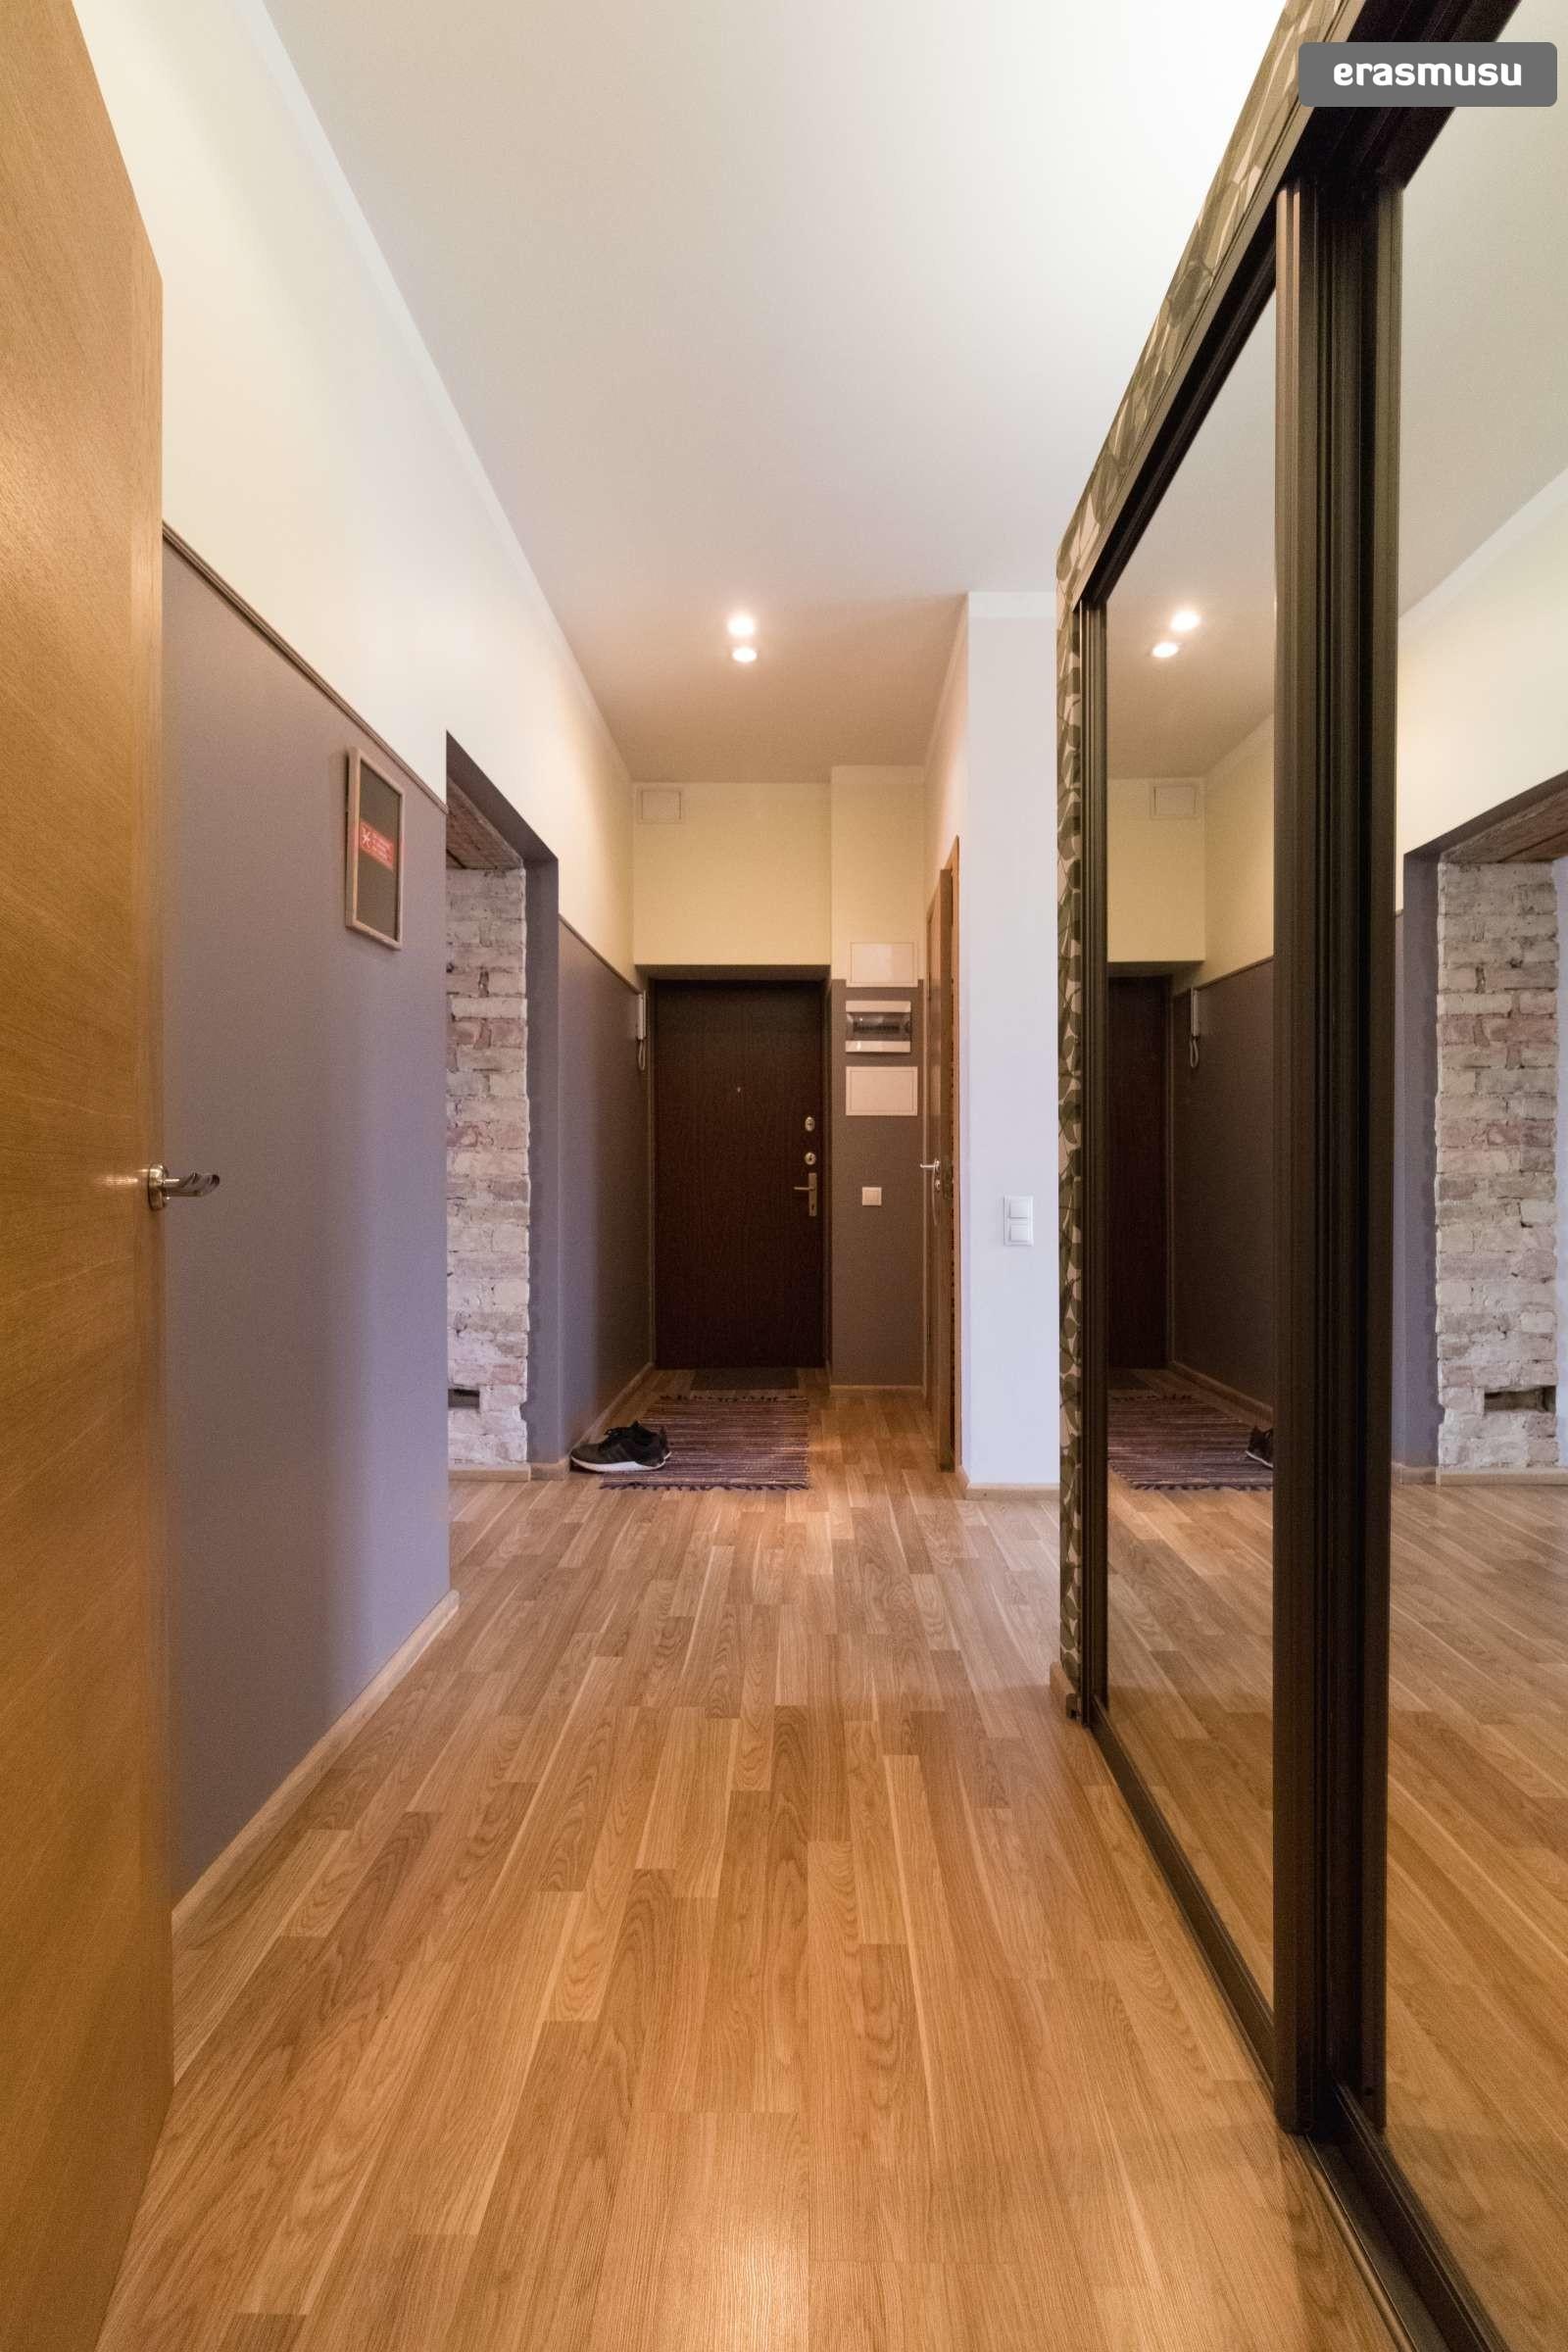 stylish-2-bedroom-apartment-rent-maskavas-forstate-8678998beba12